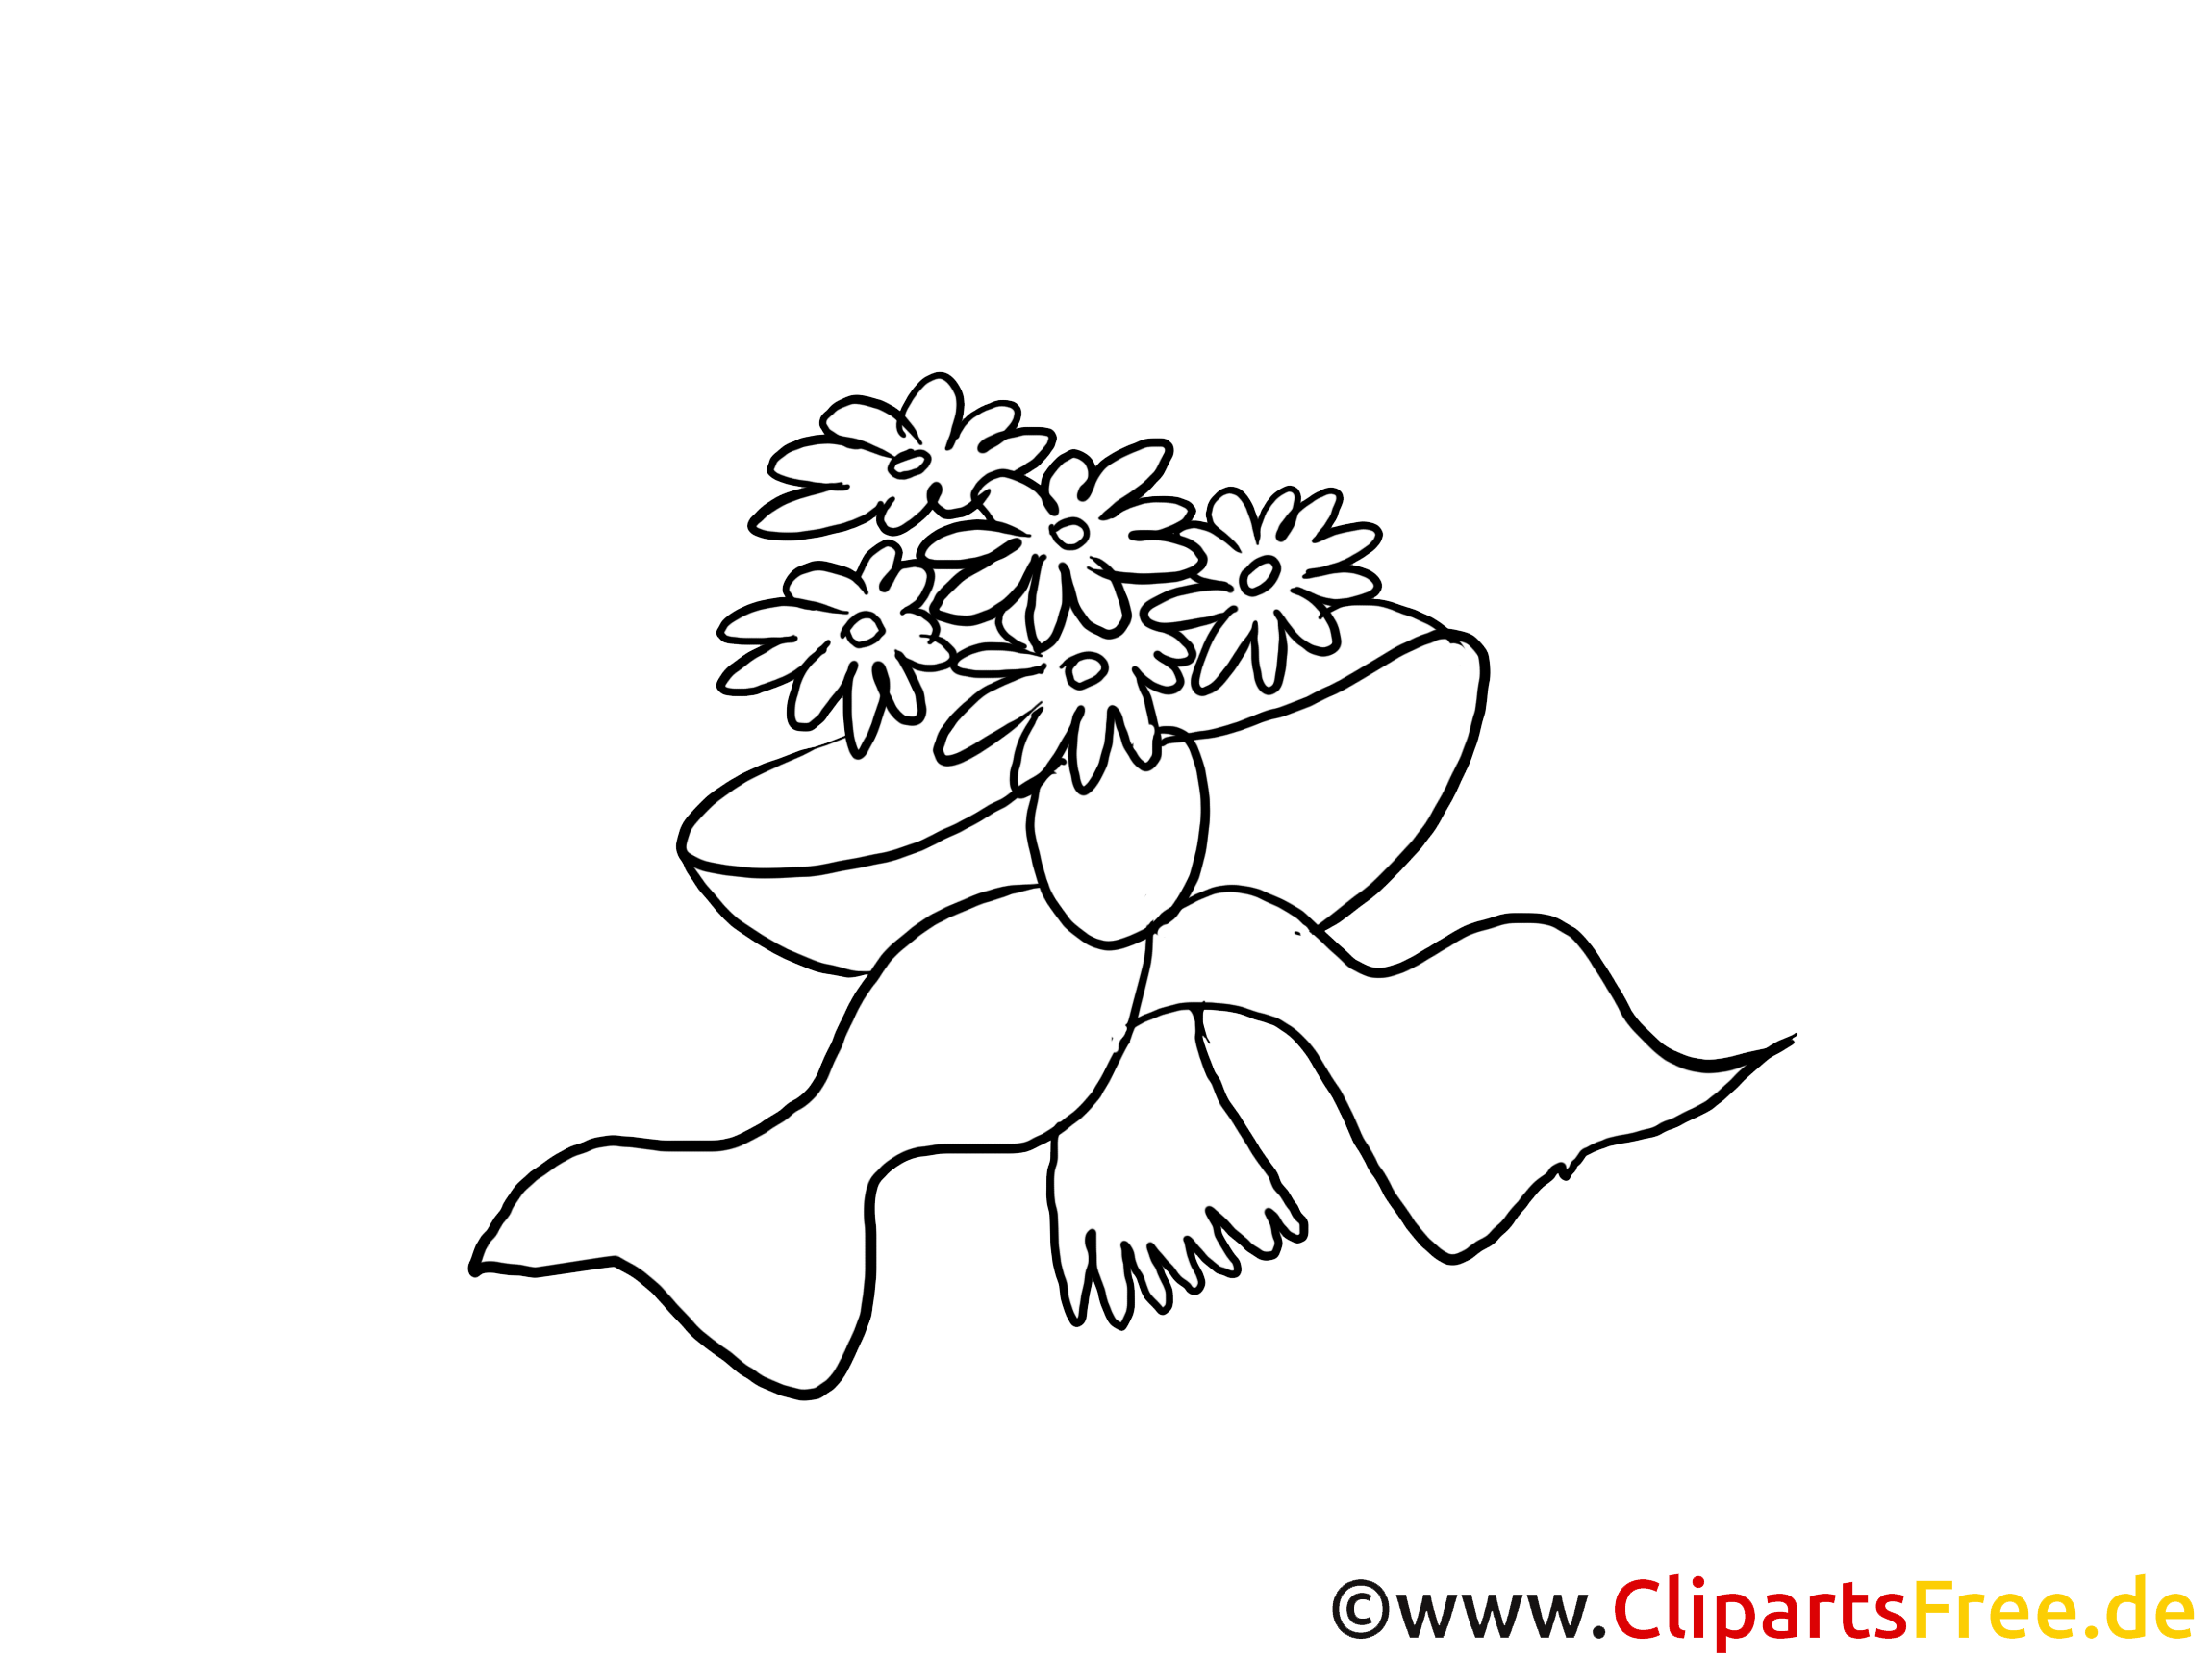 Brautblumenstrauß Clipart, Bild, Cartoon gratis